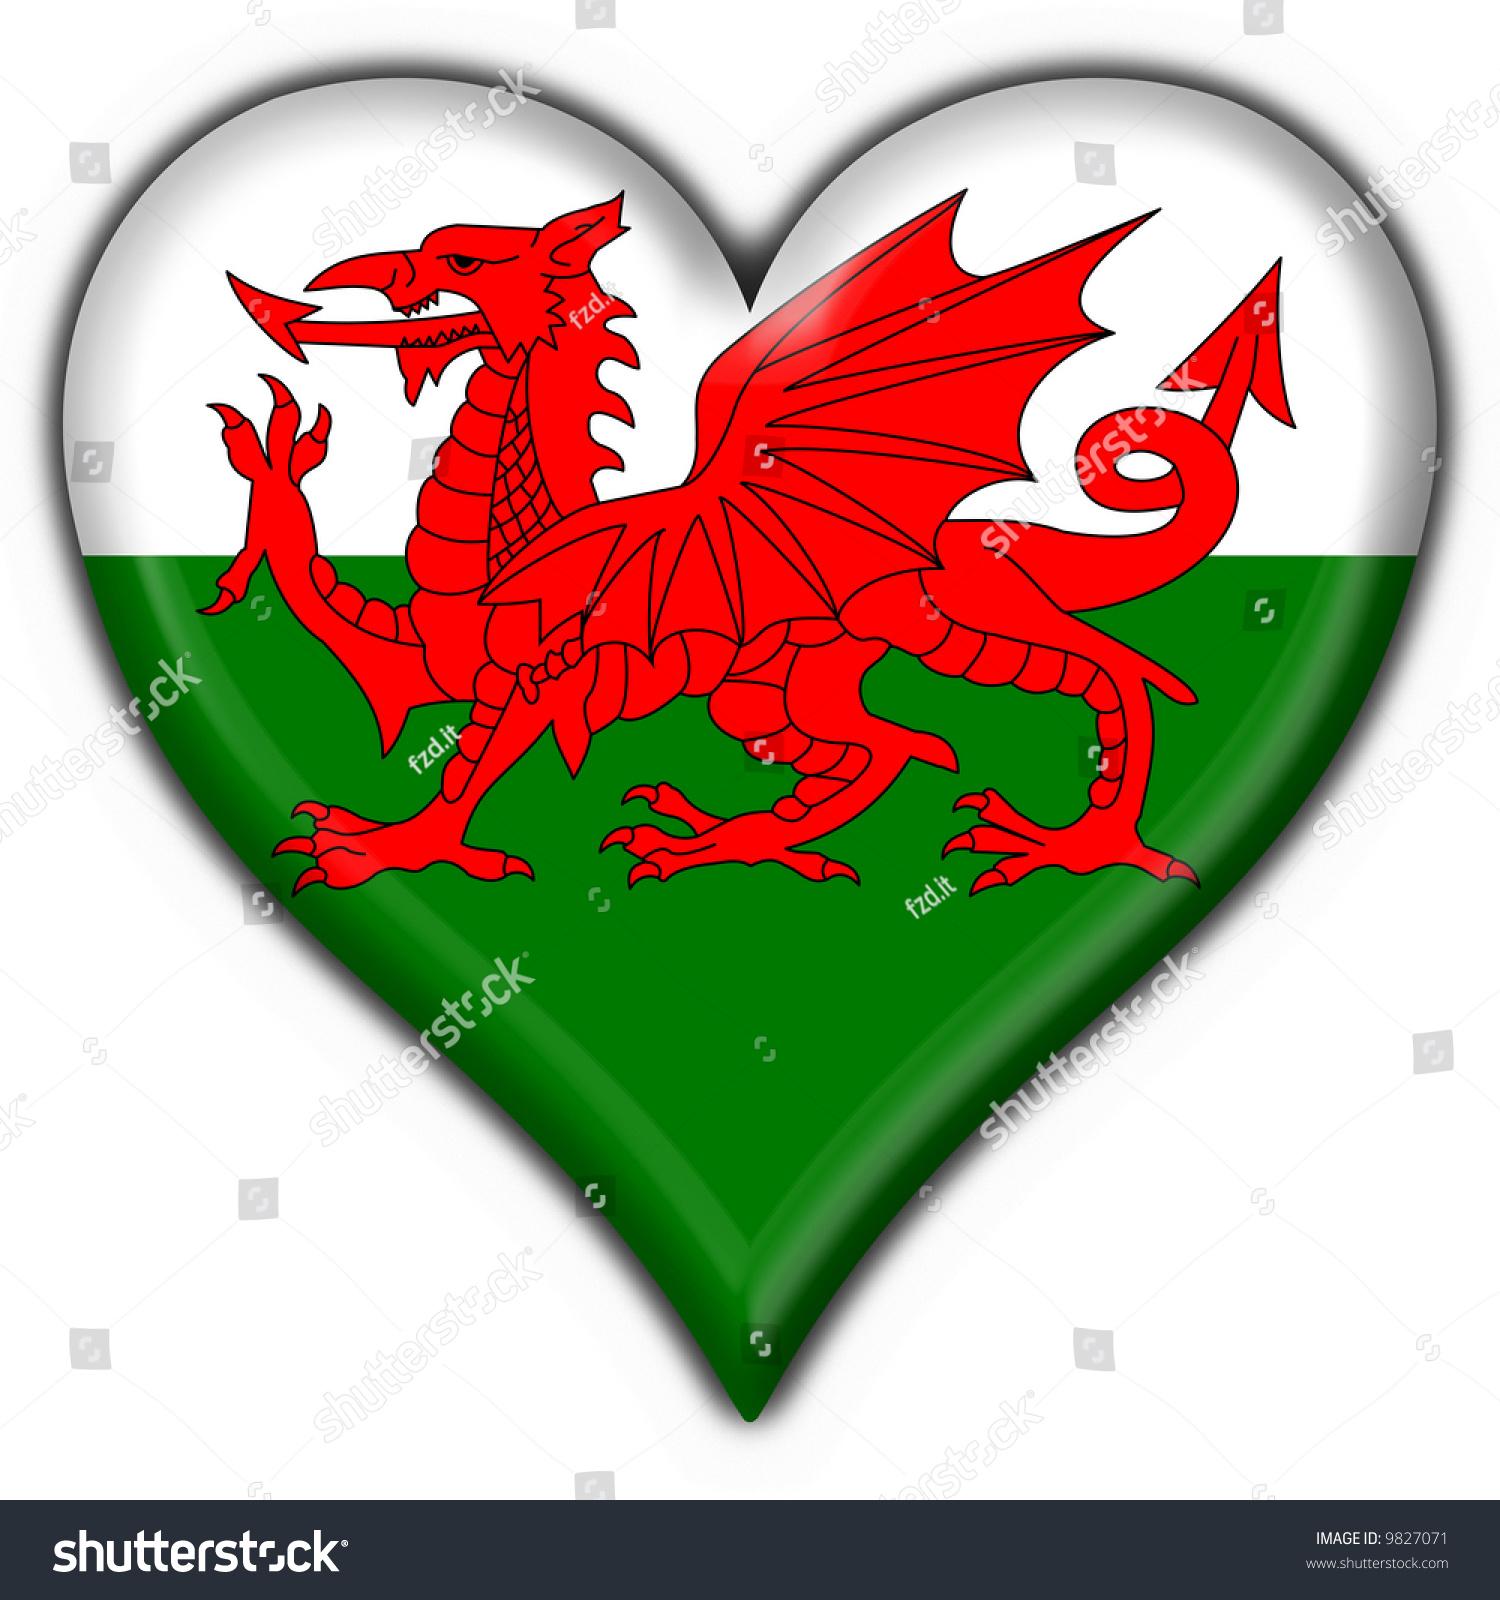 clipart welsh flag - photo #24